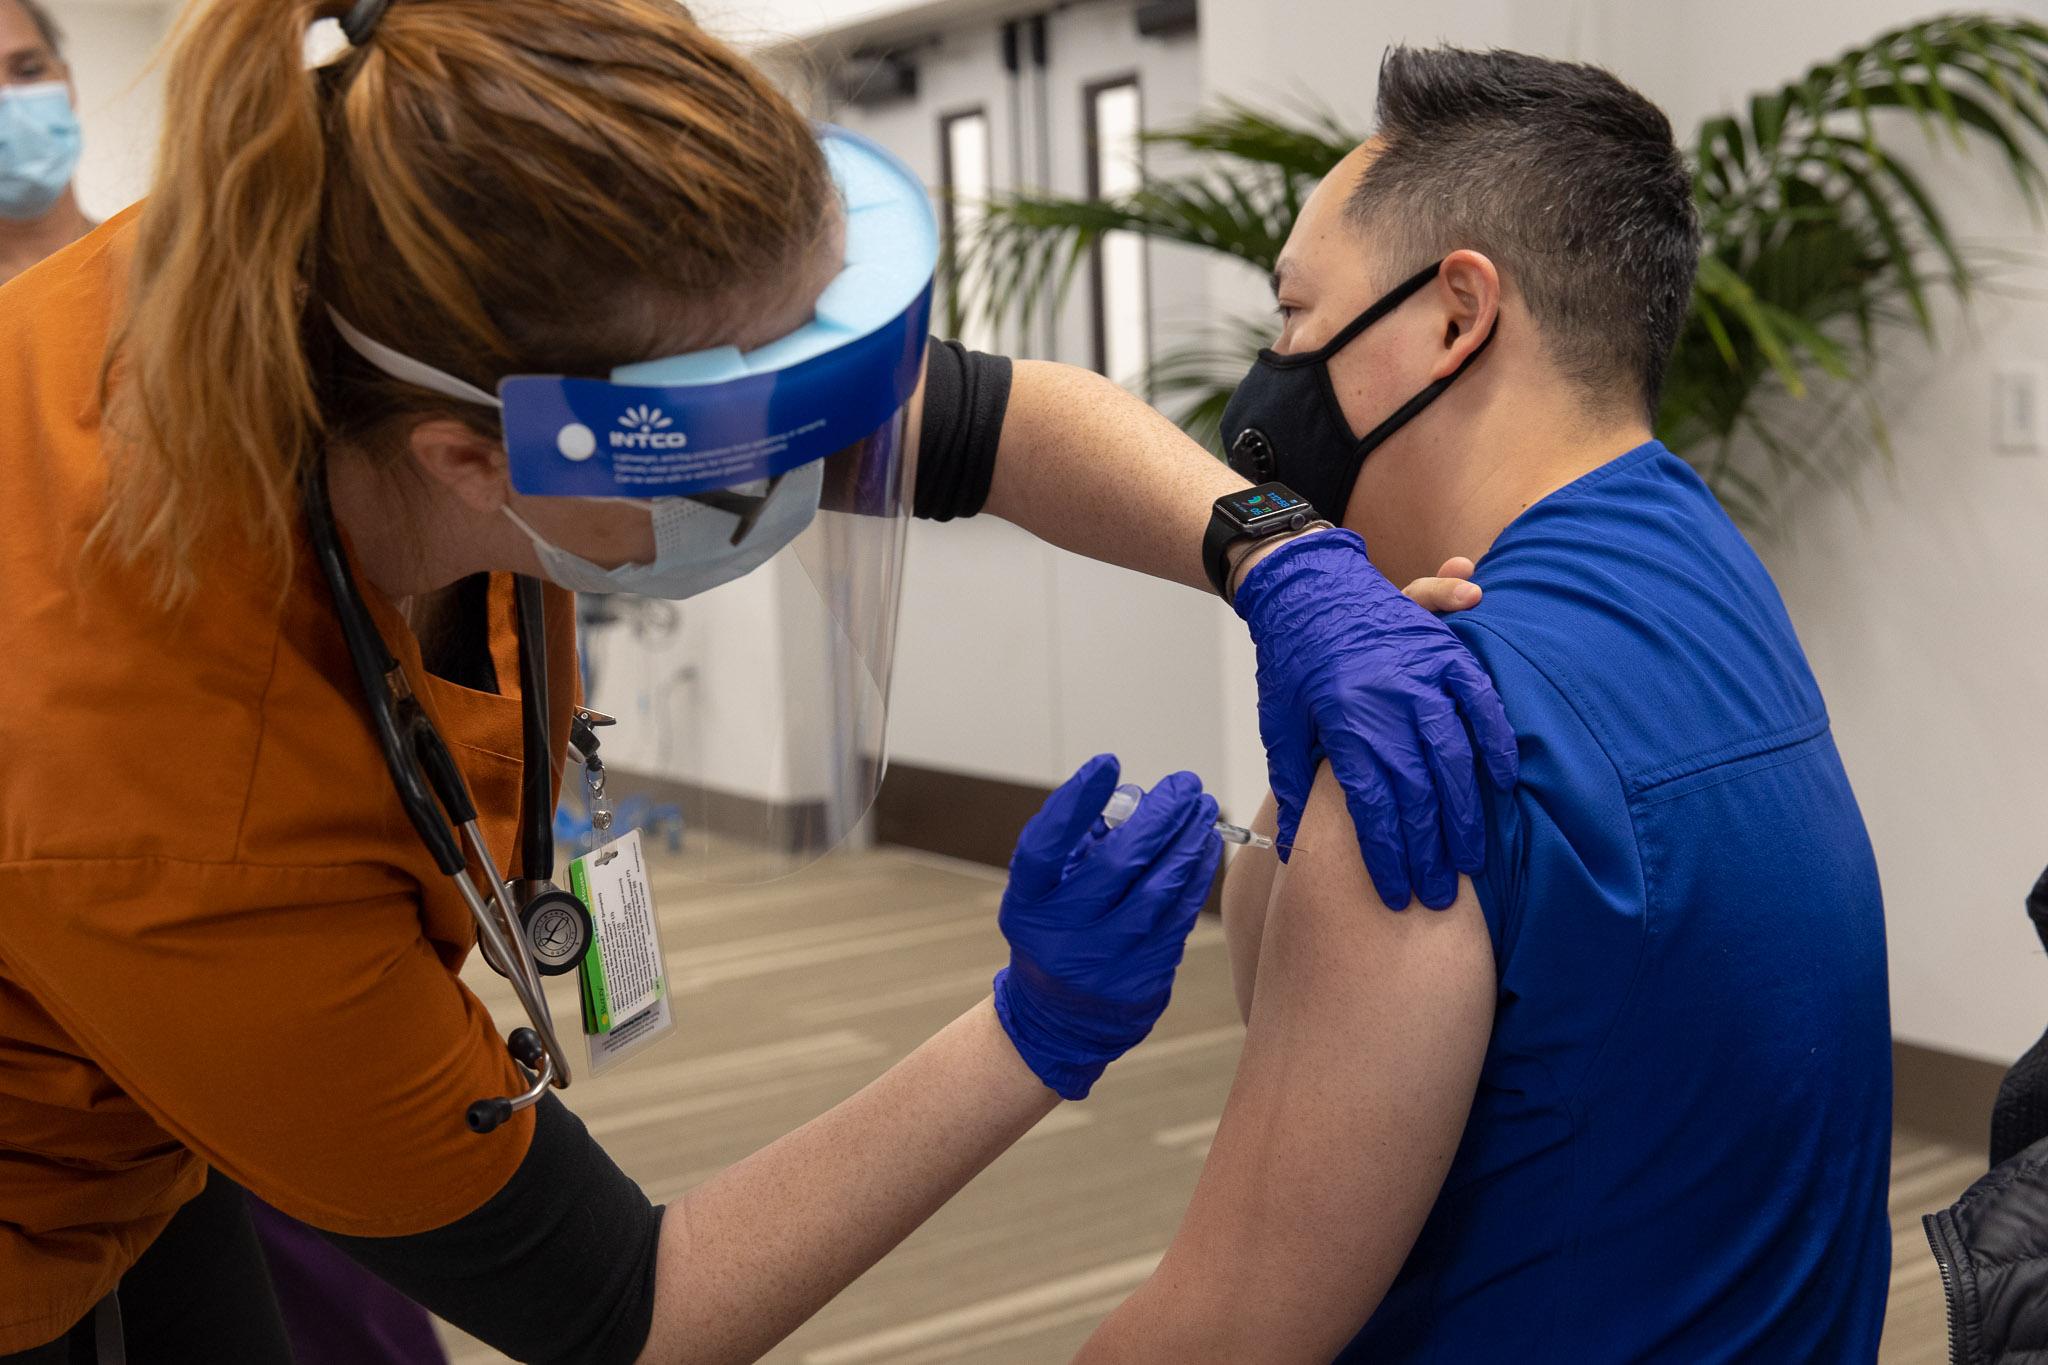 State names UT Health San Antonio's clinical practice city's latest vaccine hub